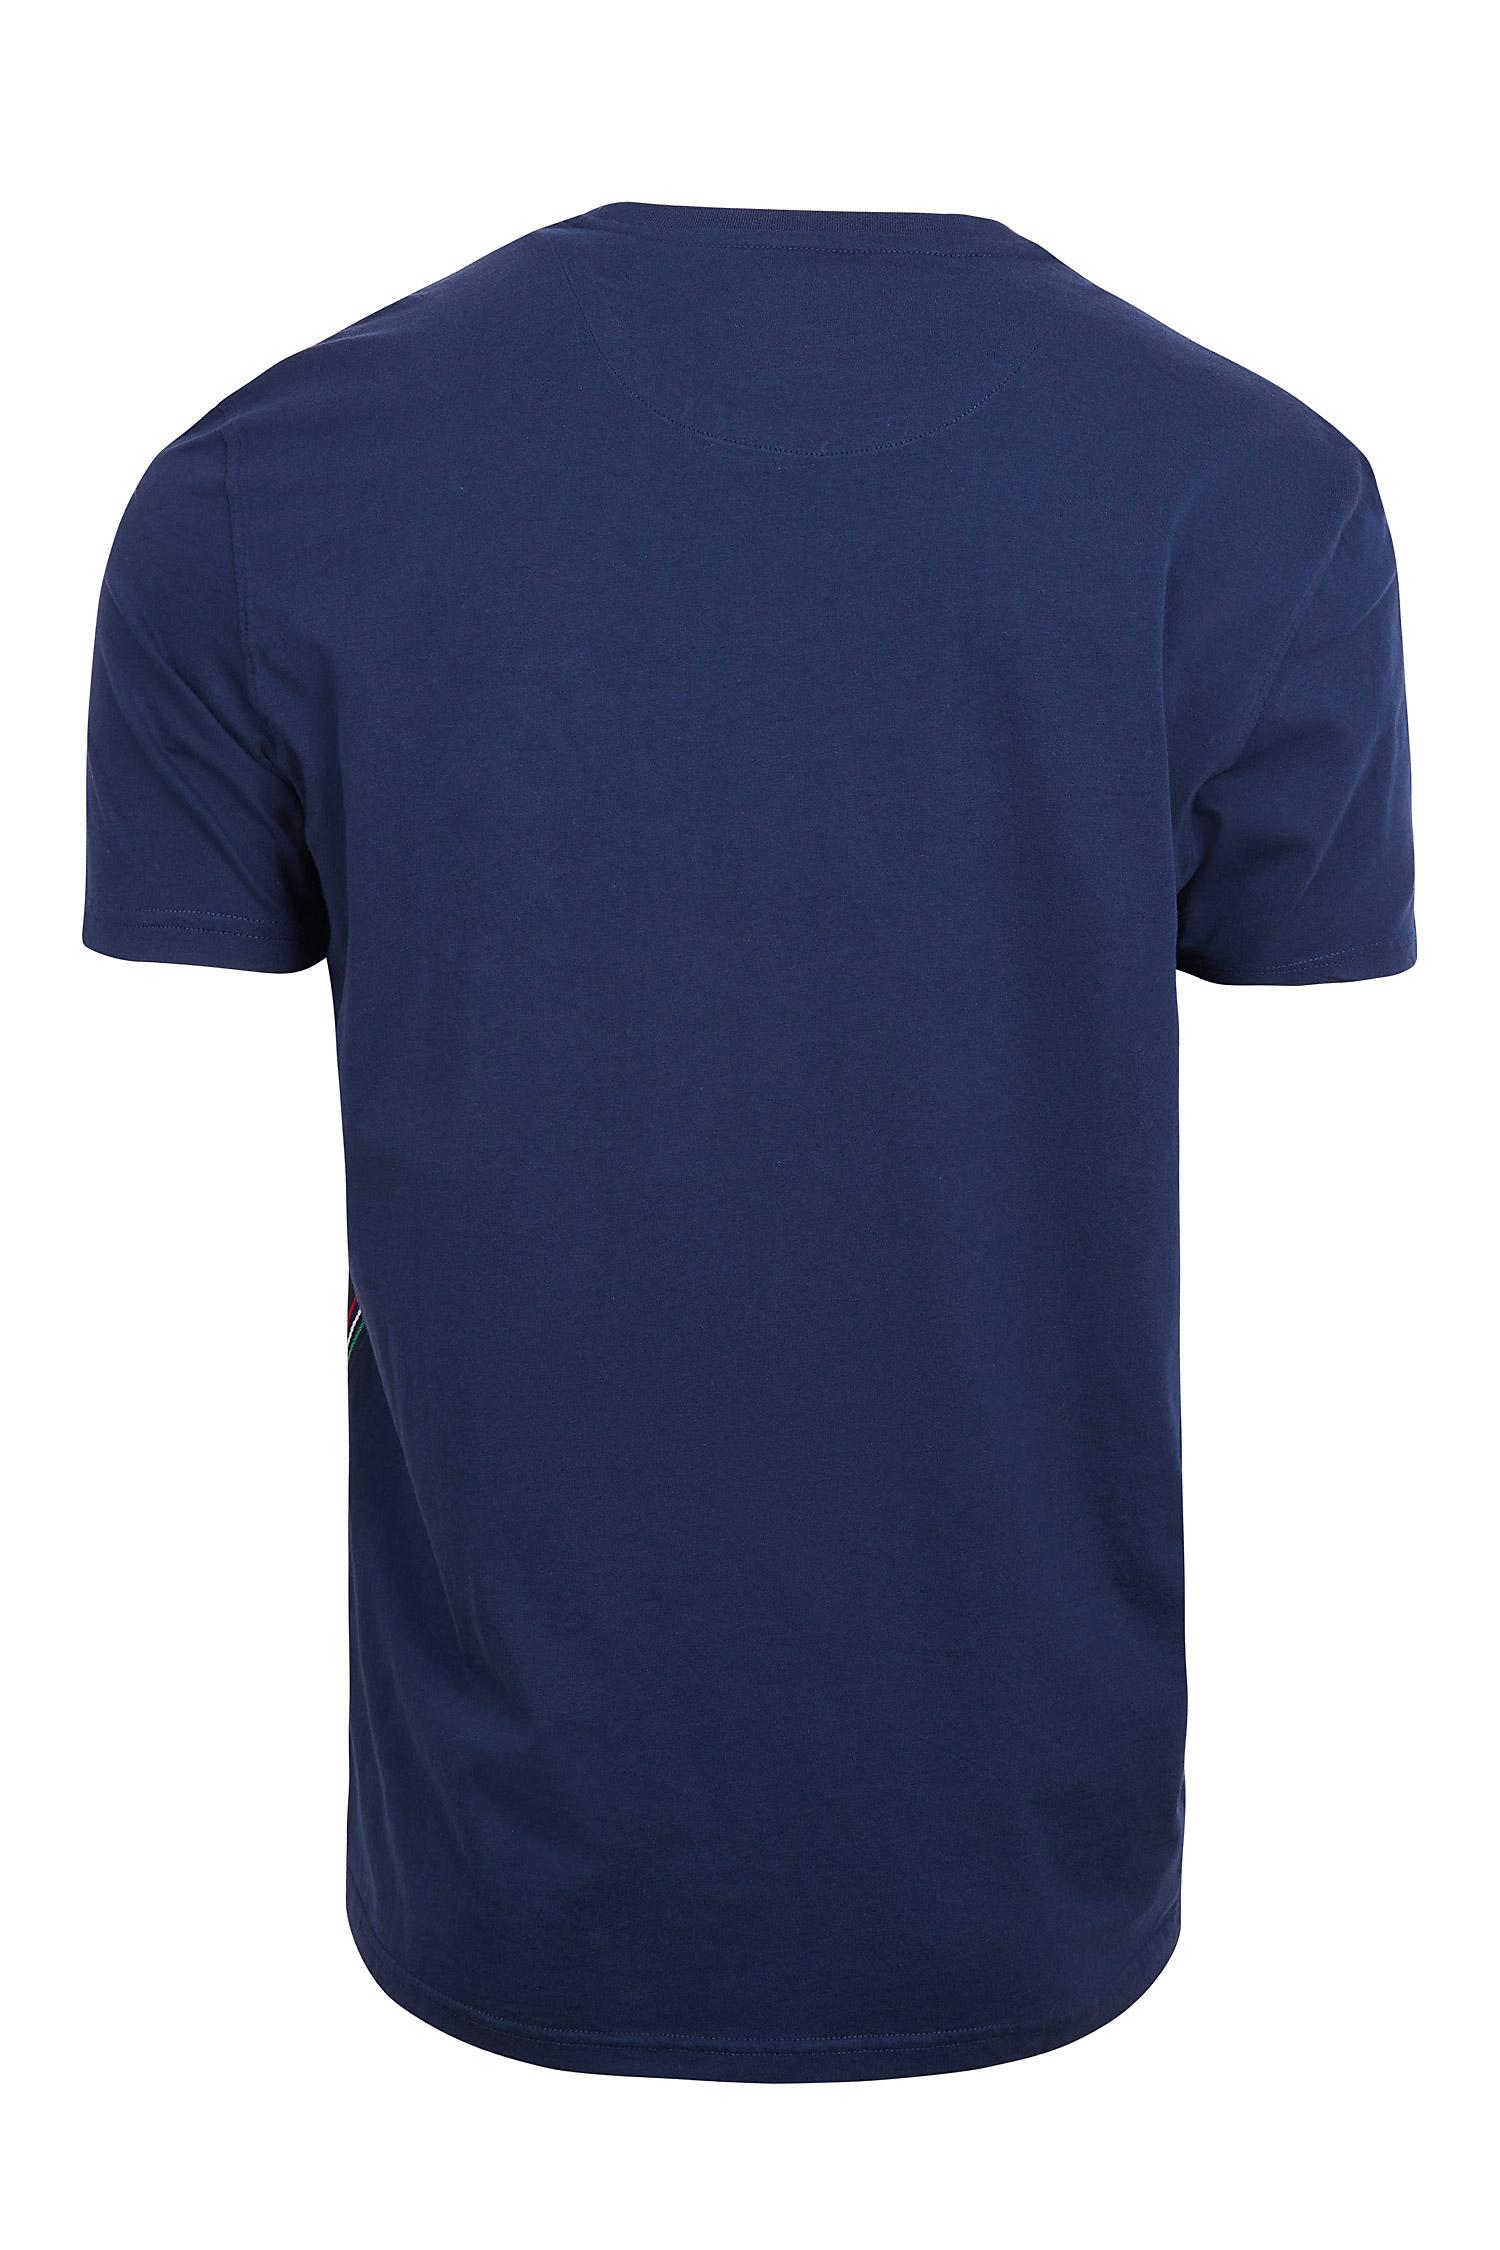 Sport, Camisetas M. Corta, 109107, MARINO | Zoom